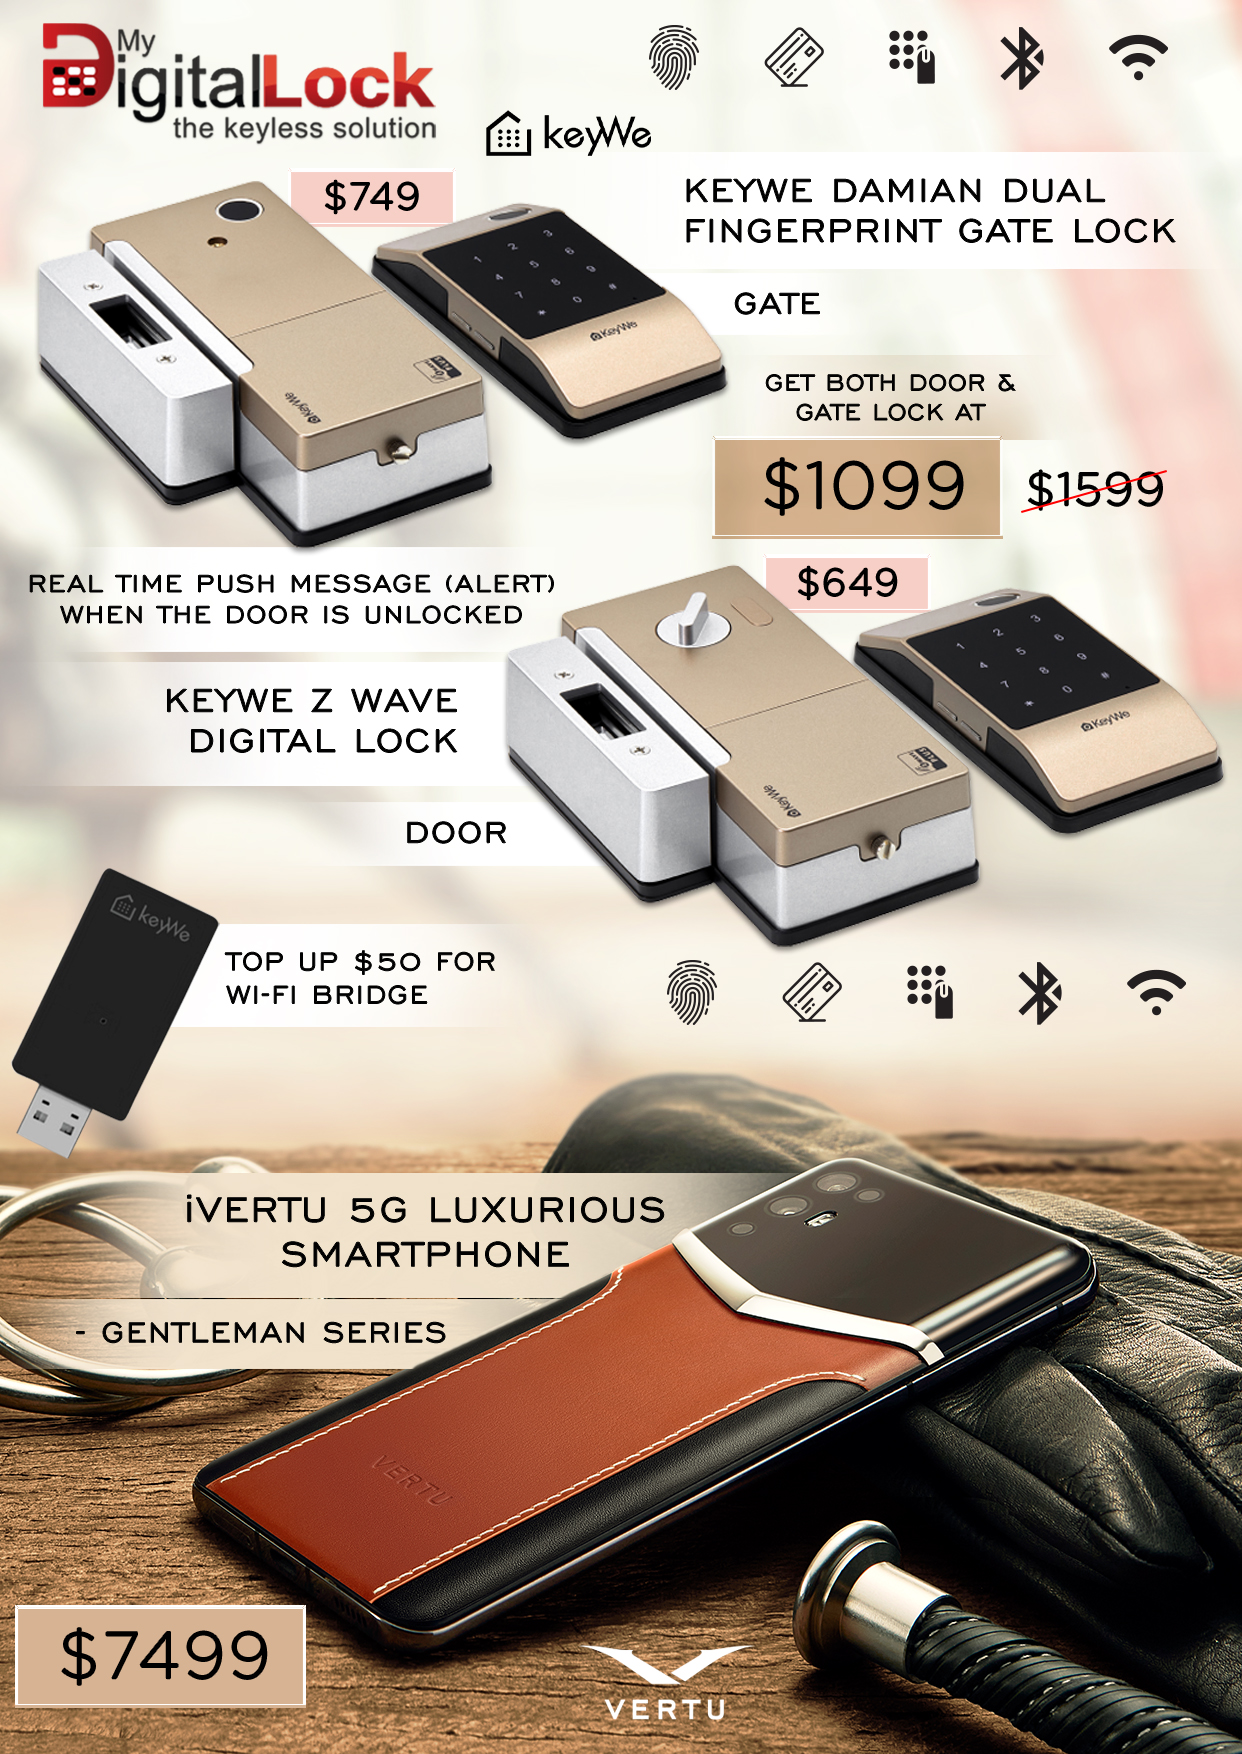 Unlock-HDB-Door-Gate-using-Keywe-Damian-Digital-Lock-iVertu-Smartphone-Promotion-2021